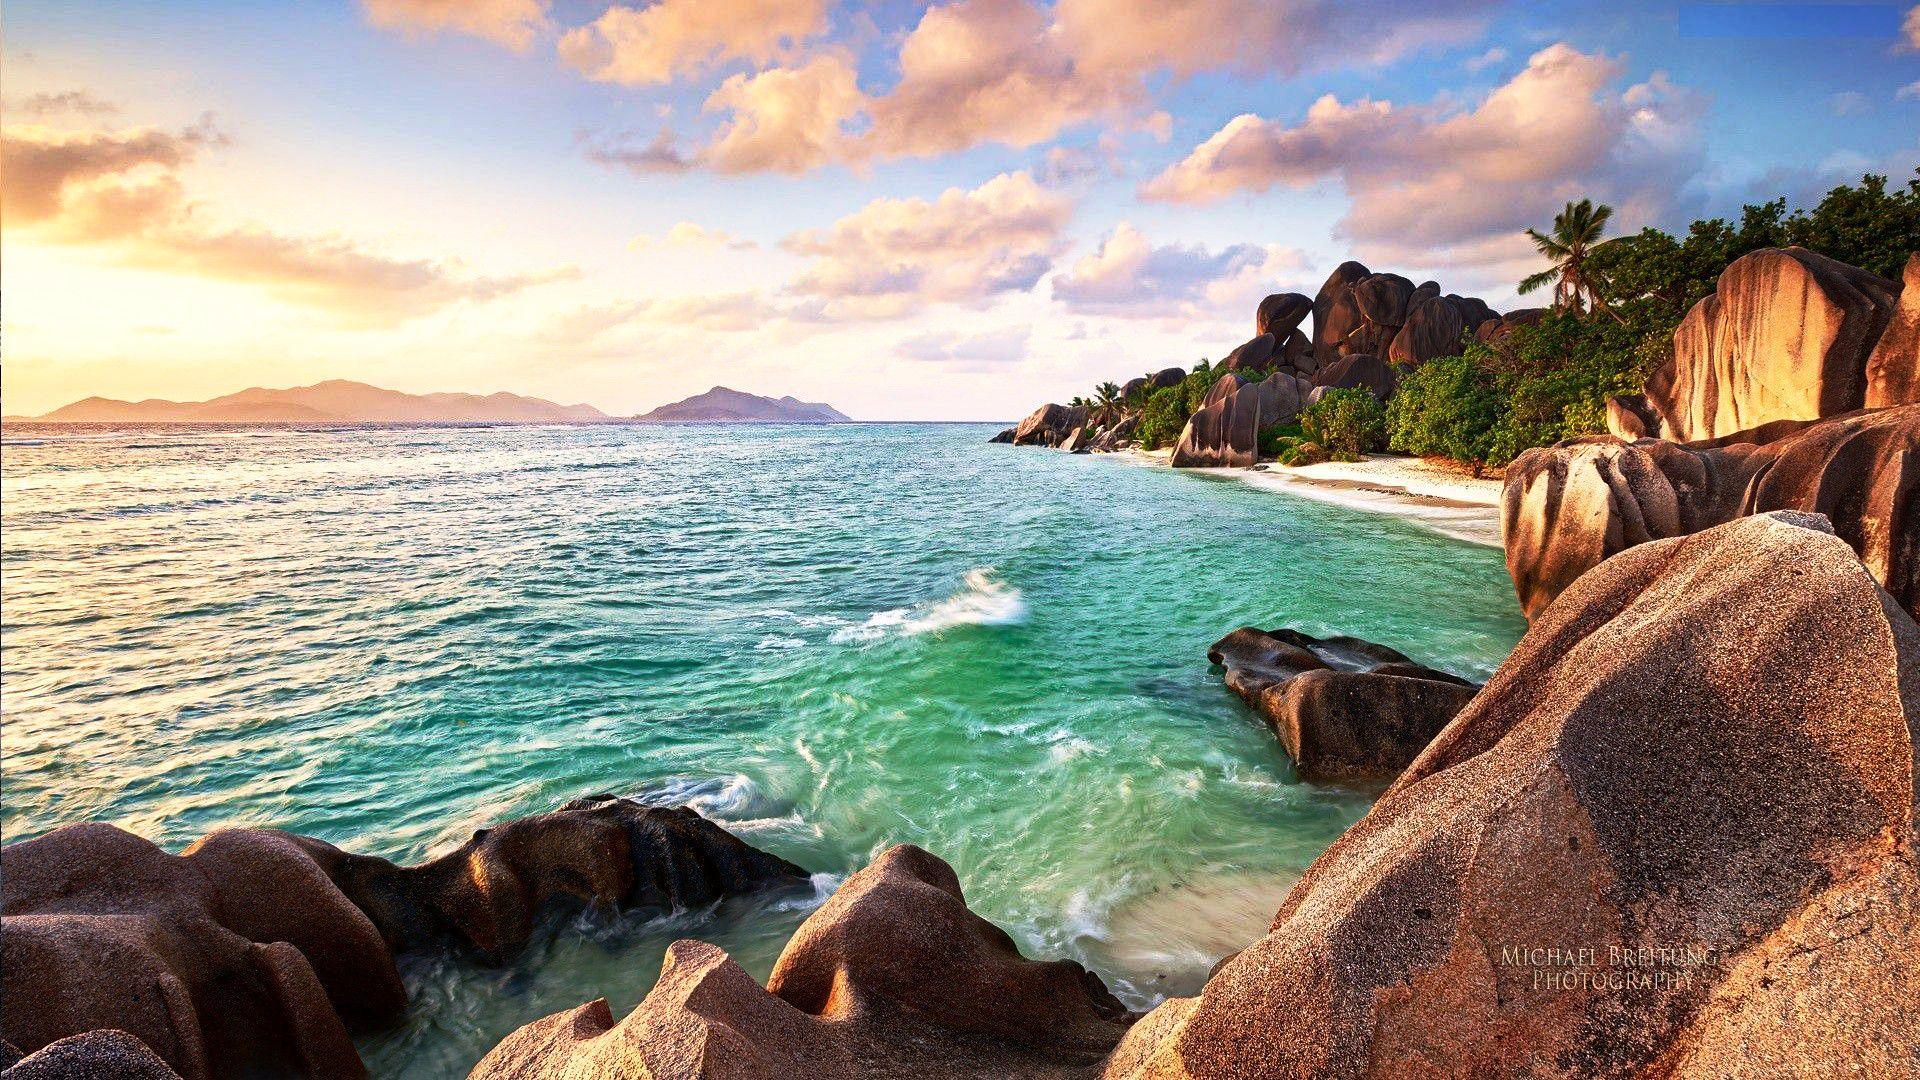 Oferta viaje a las Seychelles